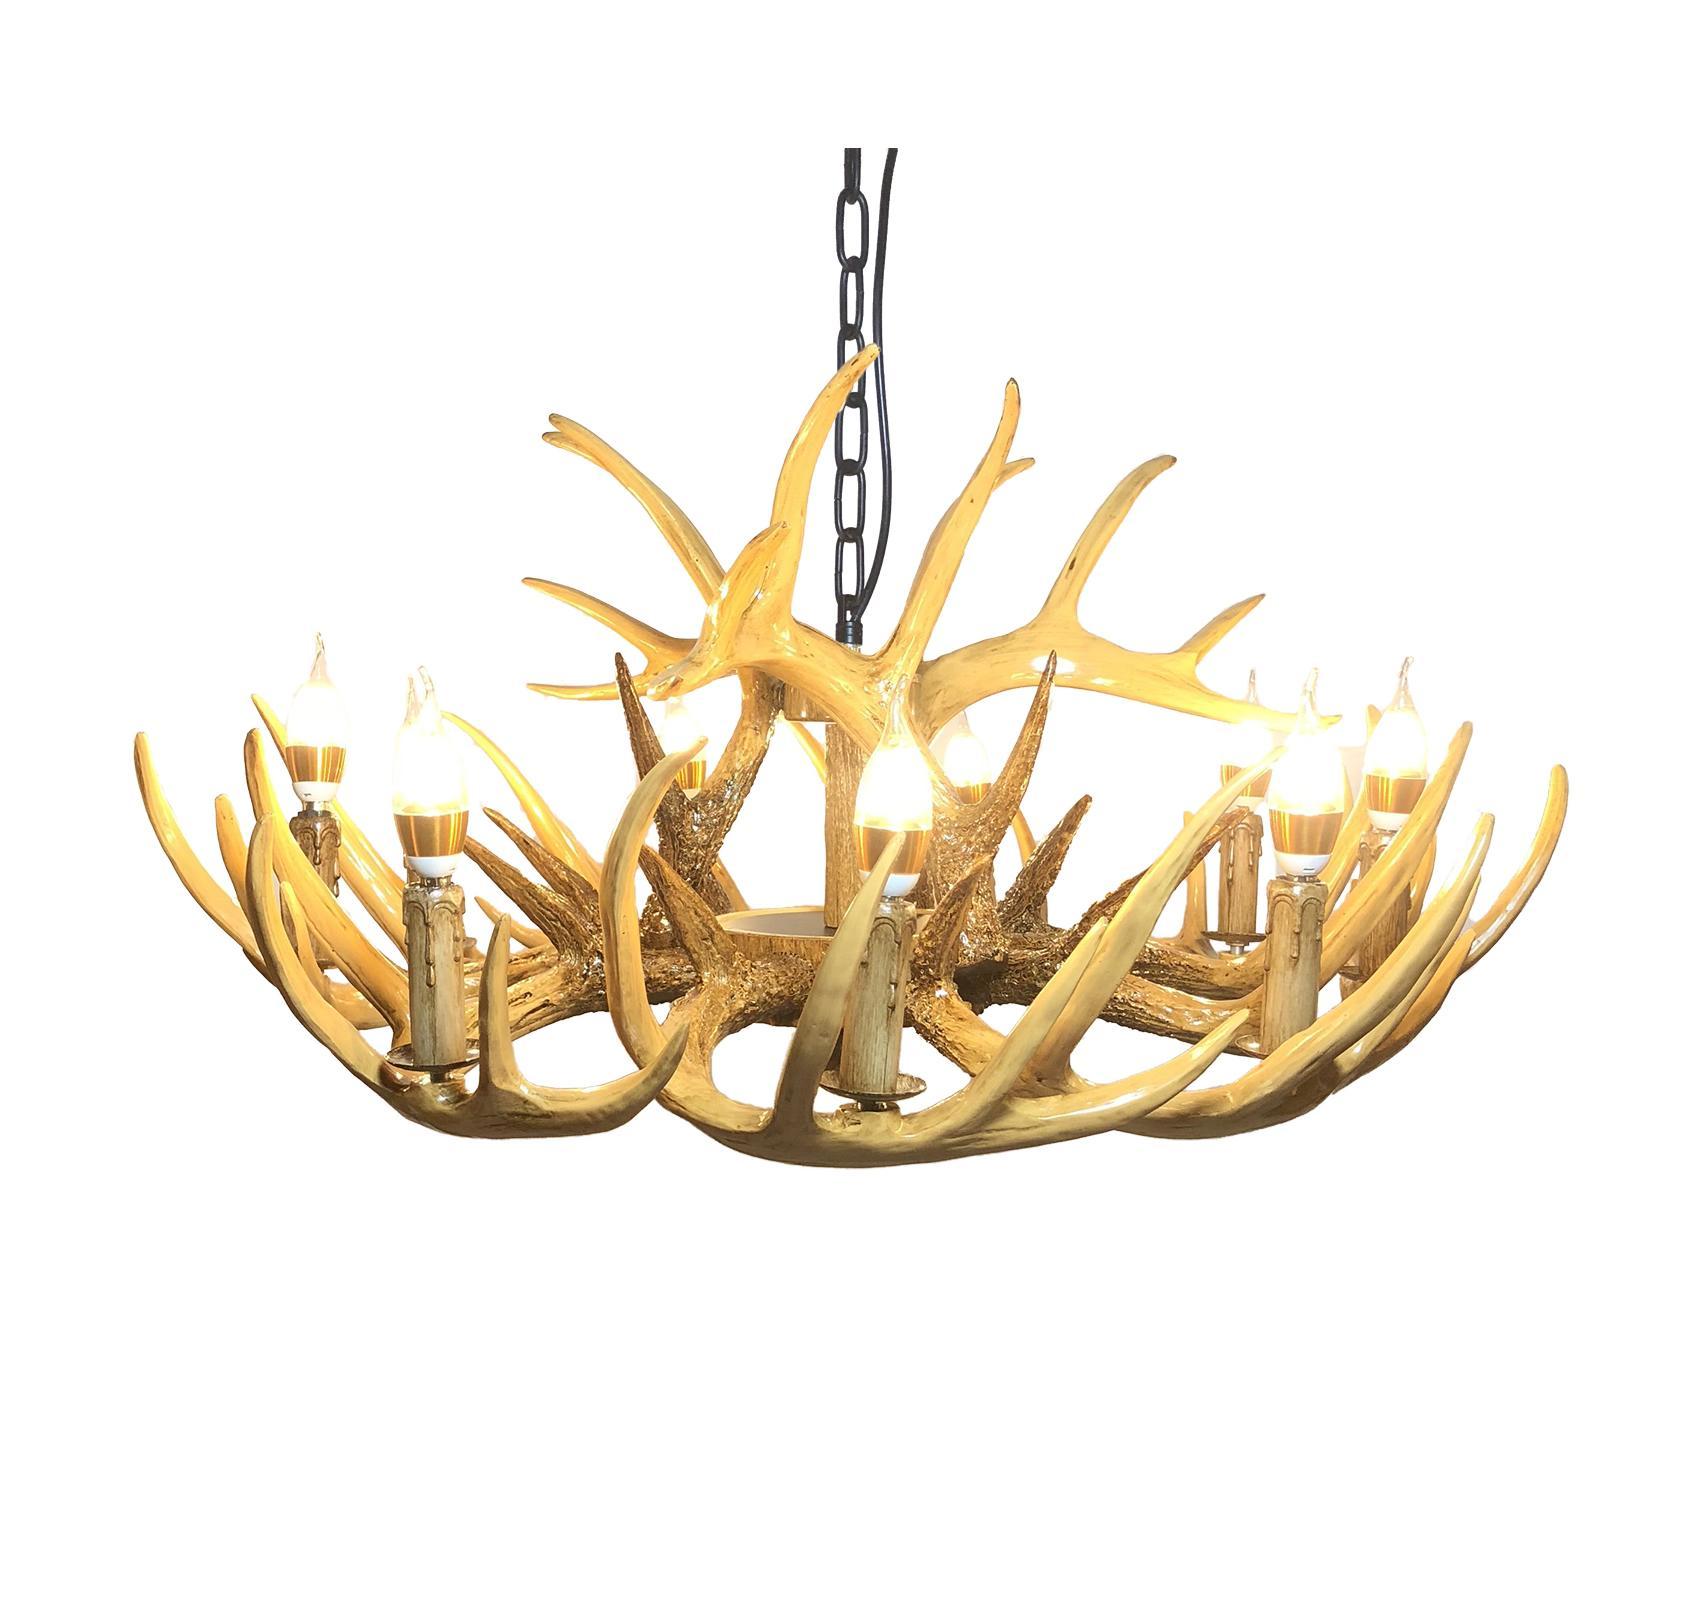 North American Antler Lustre Éclairage Rétro Résine Cerflam Lampes Modern Accueil Décoration Cuisine E12 UL-UL-UL-UL-UL-VIDE